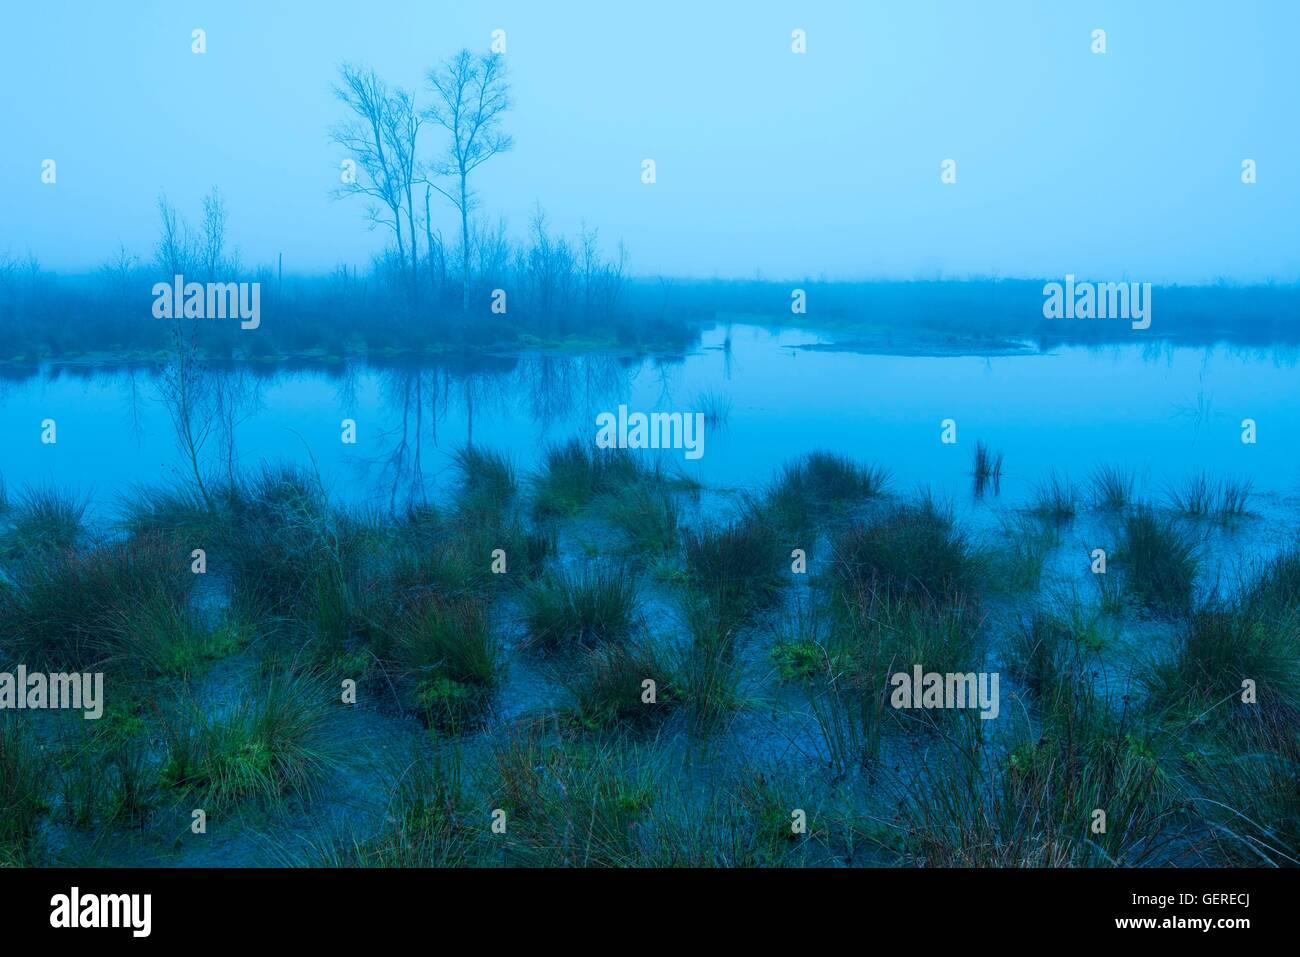 Moor zur blauen Stunde, Goldenstedter Moor, Niedersachsen, Deutschland - Stock Image